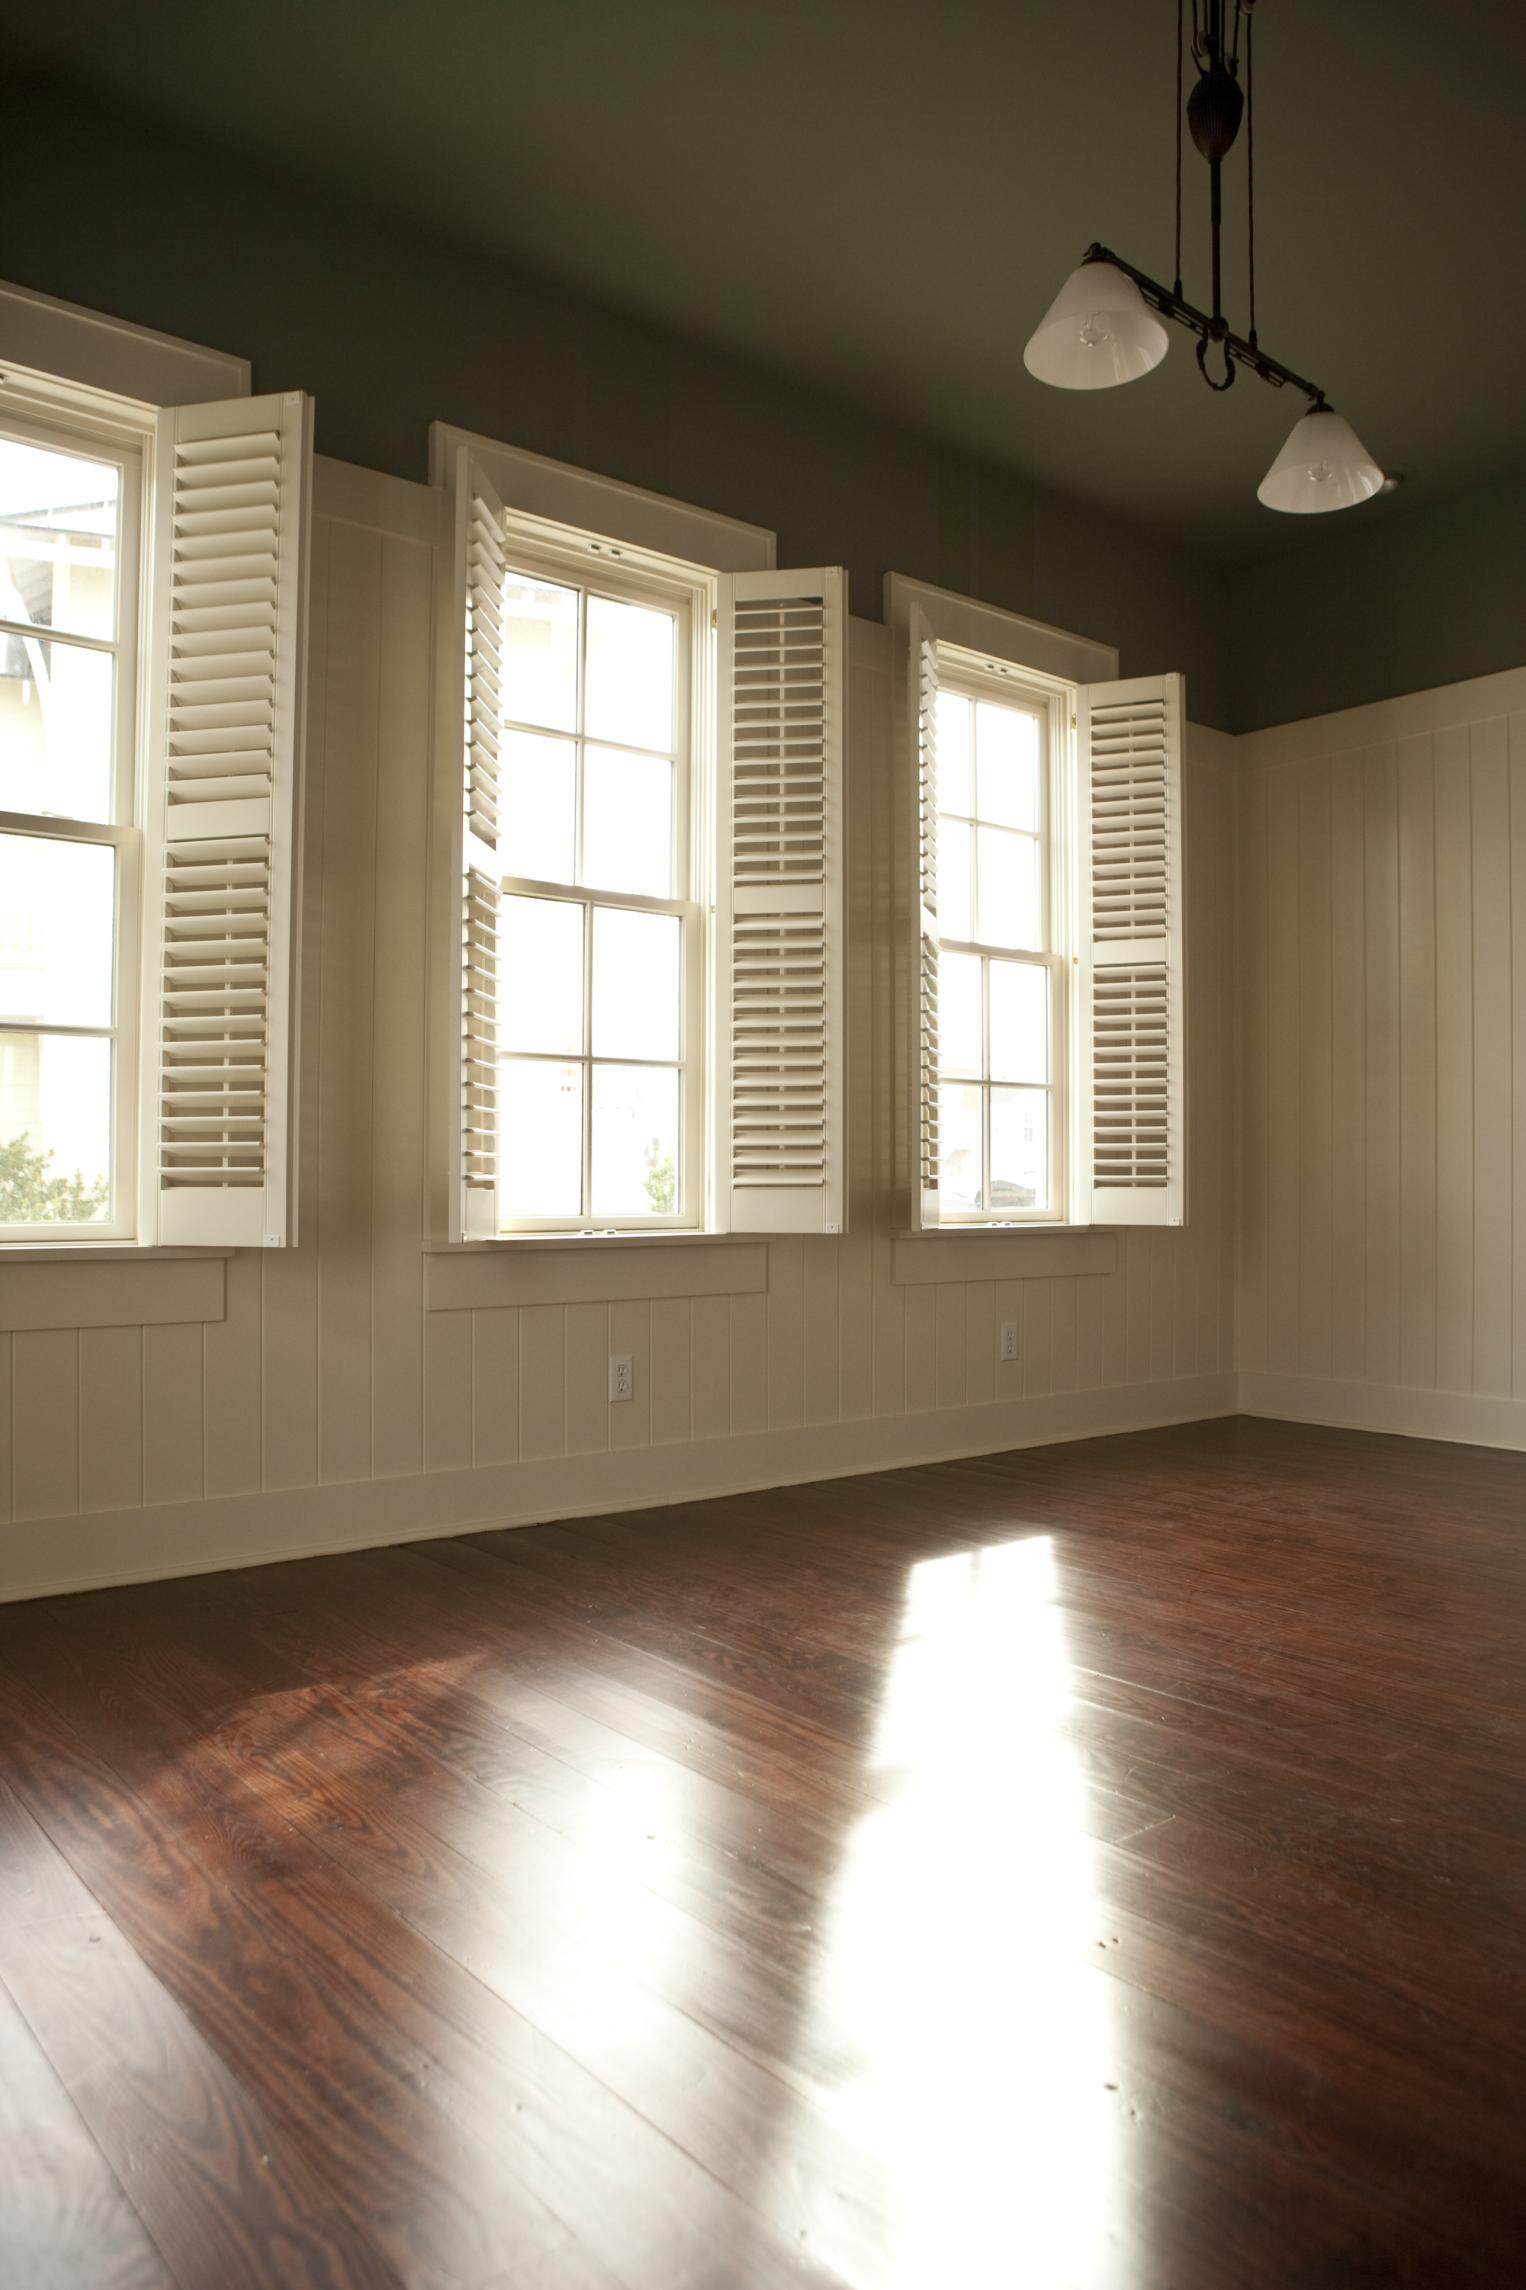 wax liquid luster won diy cover floor the shine image work floors hardwood t quick when for best